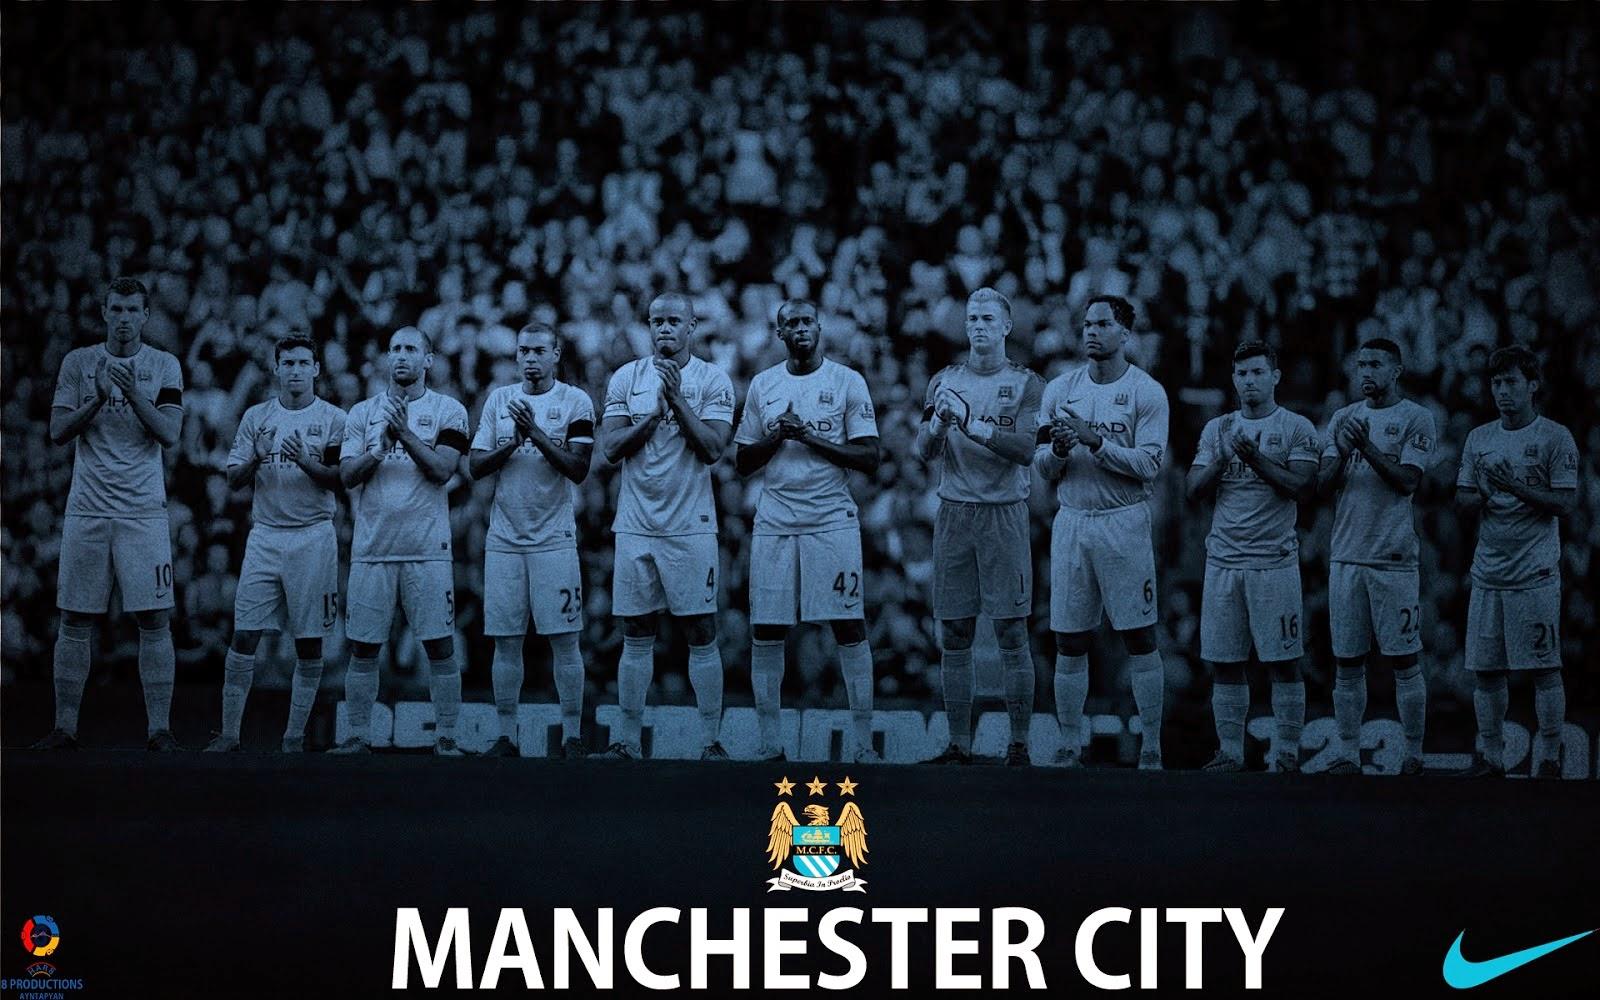 Soccer Bedrooms Manchester City Football Club Wallpaper Football